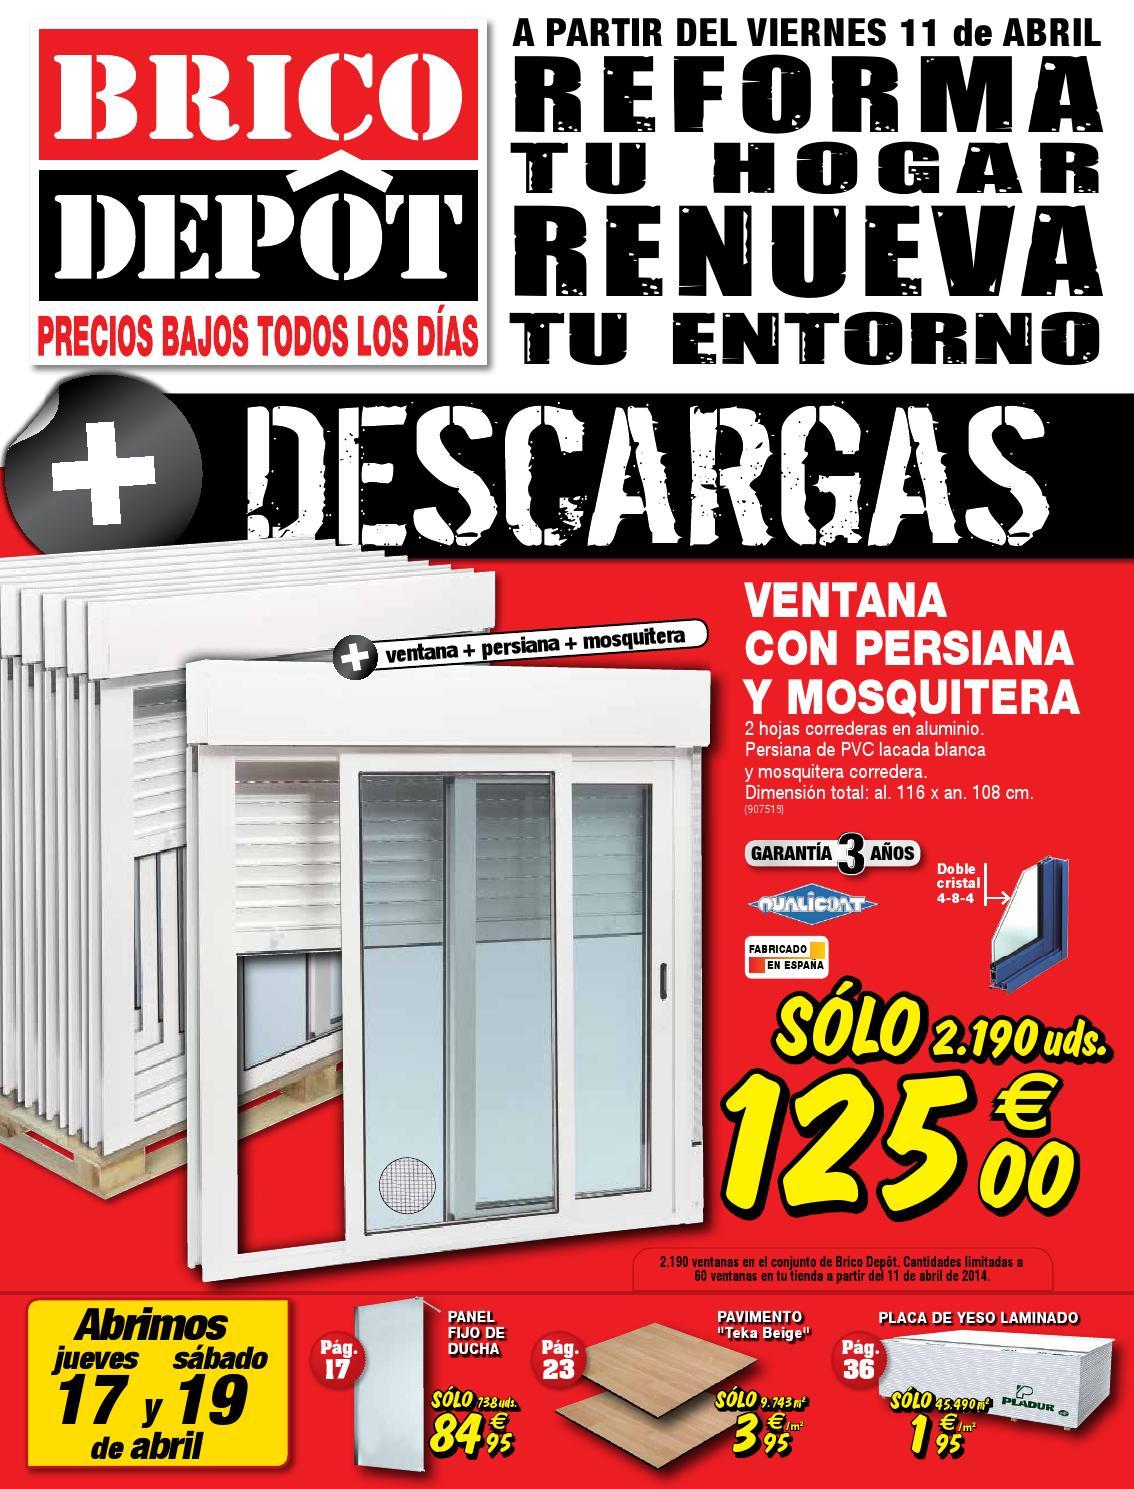 Bricodepot catalogue 11 24abril2014 by catalogopromociones for Motor puerta corredera bricodepot